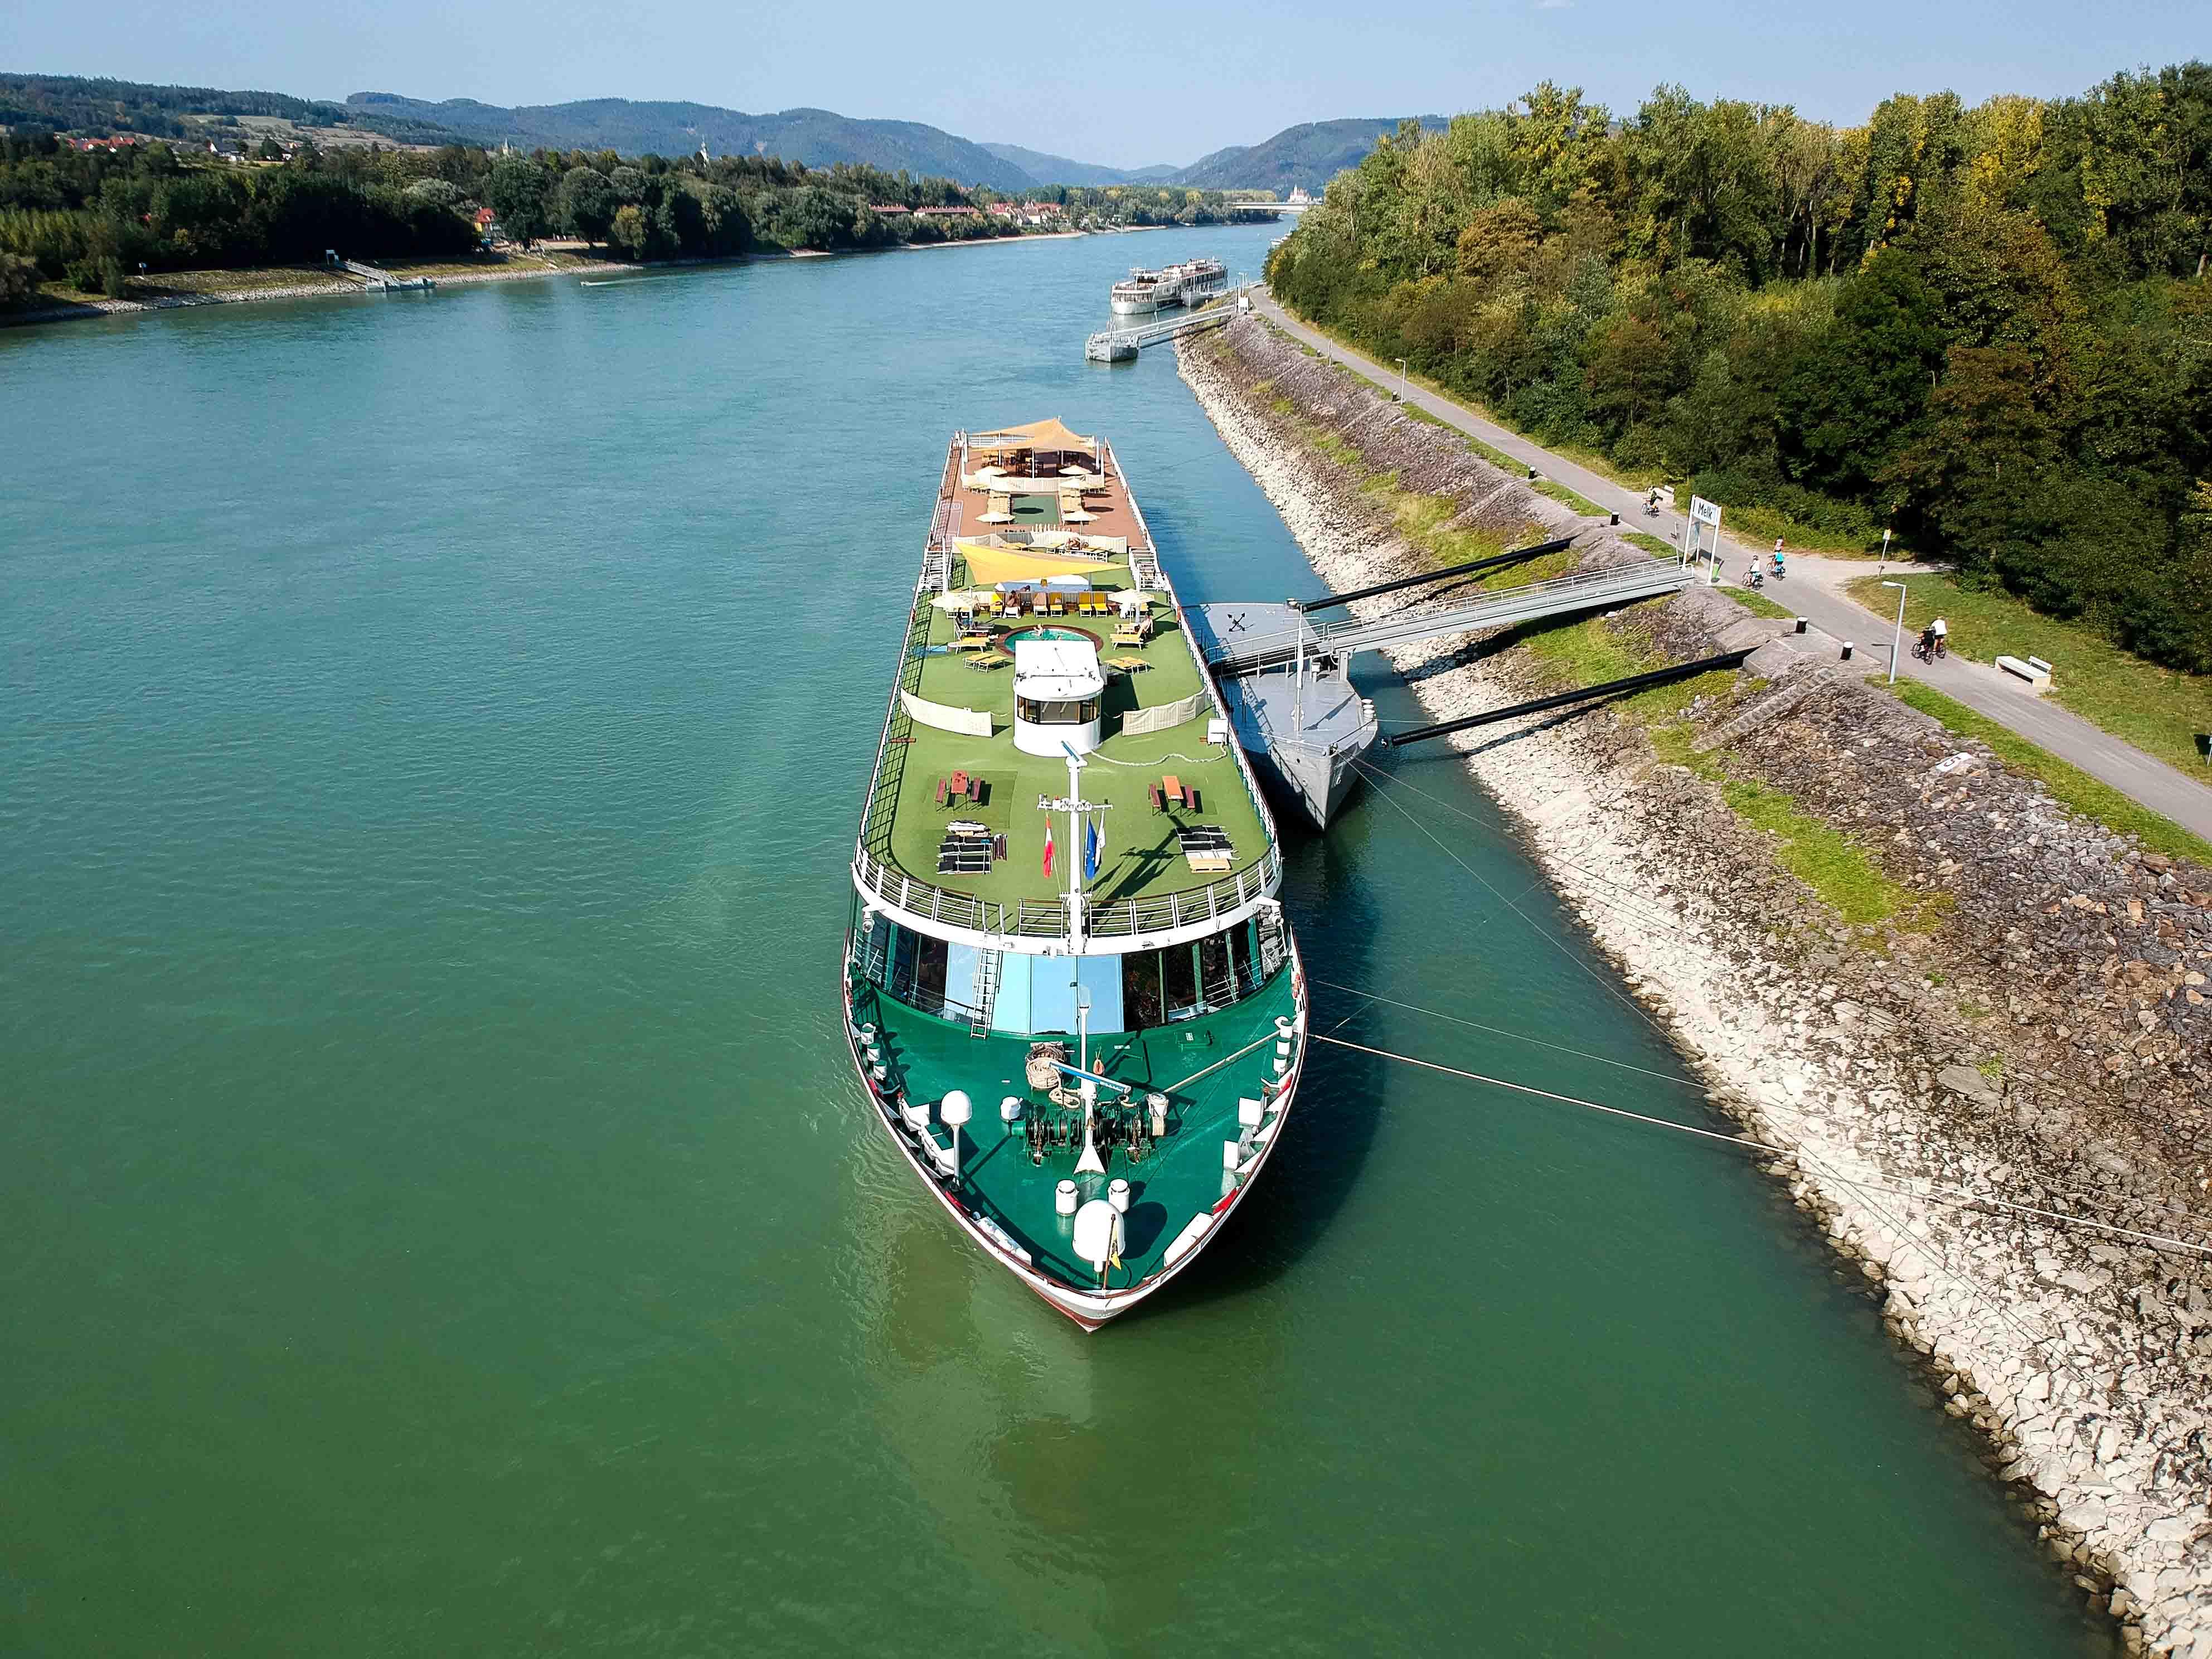 Donaukreuzfahrt-A-Rosa-Bella-Flusskreuzfahrtschiff-Donau-Arosa-Deck-Drohne